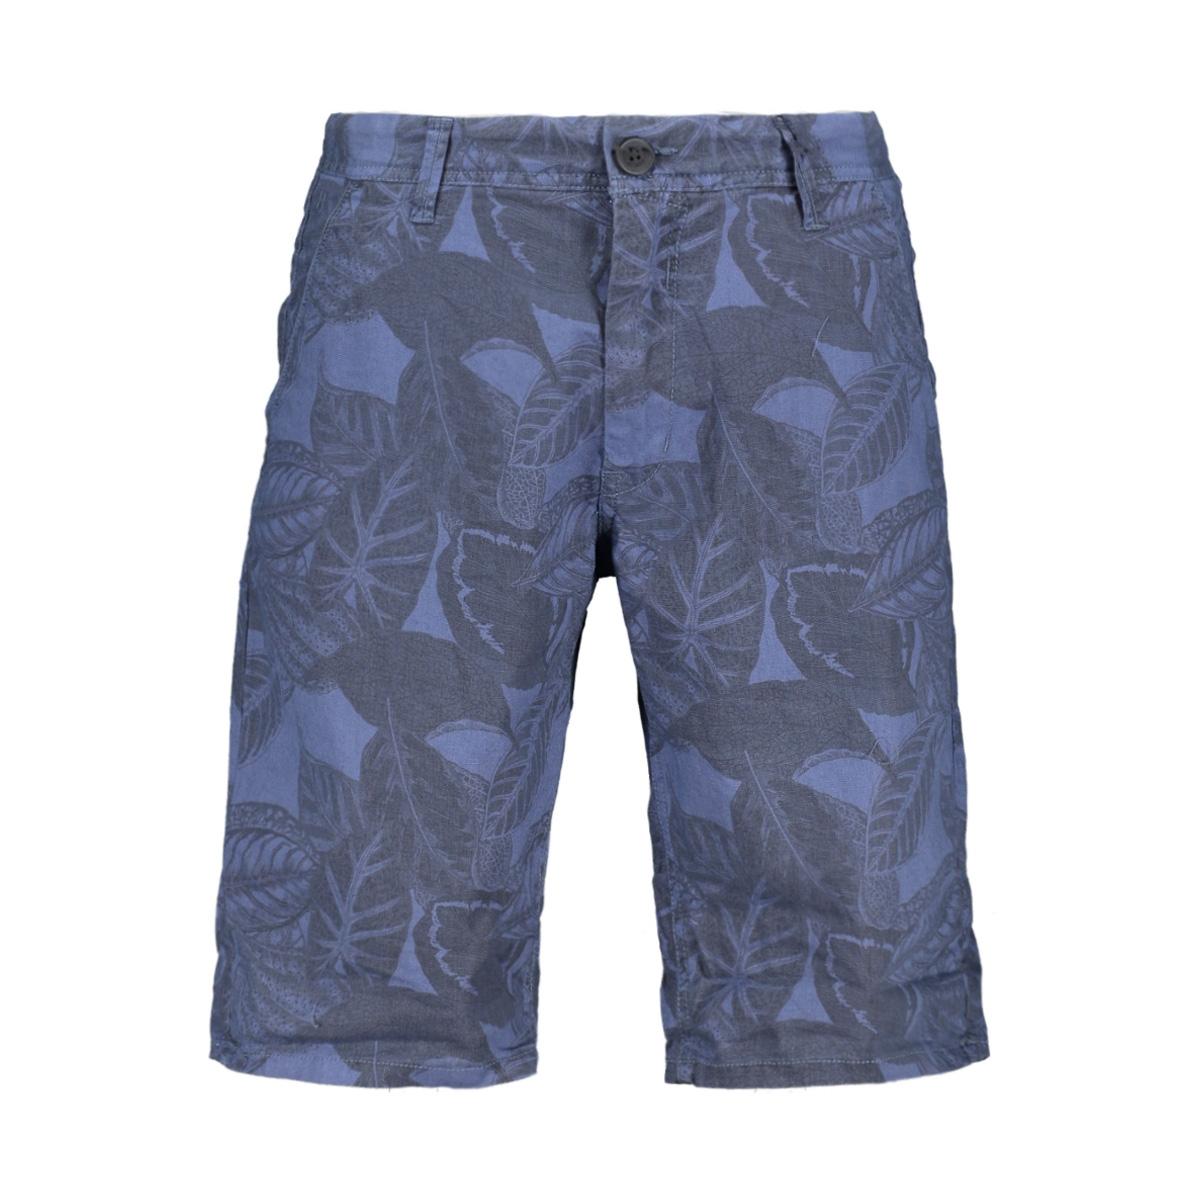 santo short met allover print e91375 garcia korte broek 3263 airforce blue